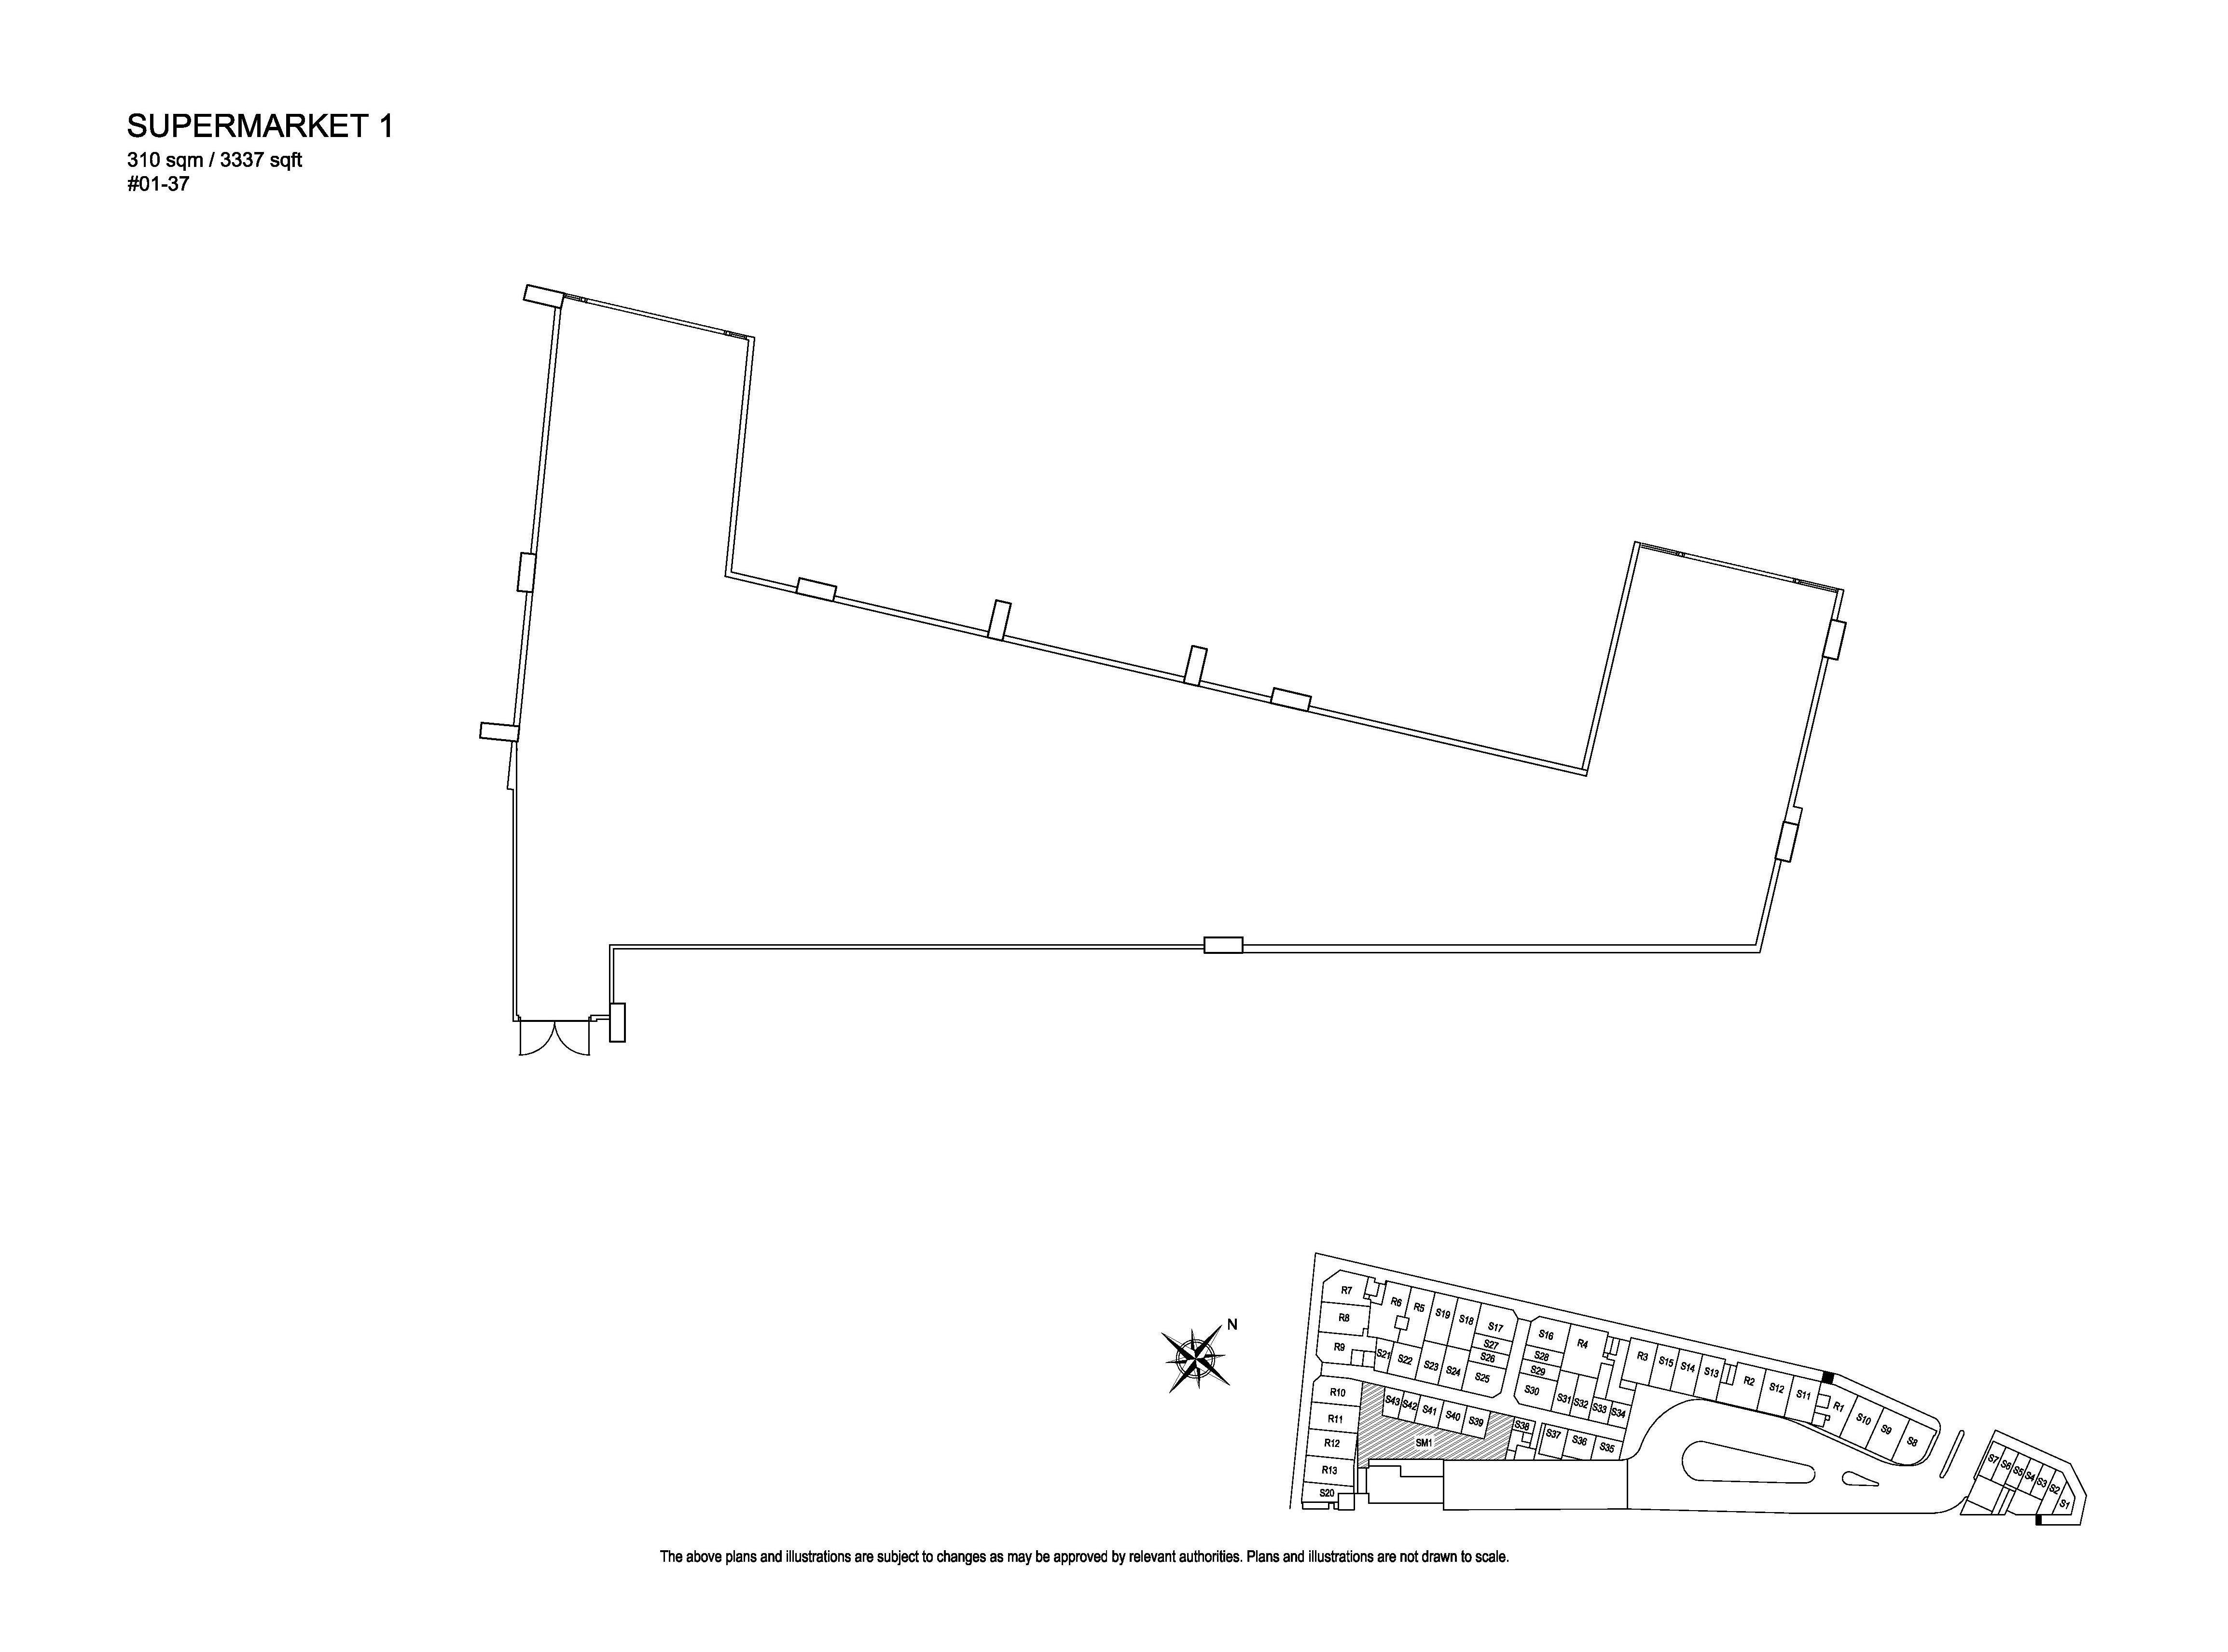 Kensington Square Supermarket 1 Floor Plans